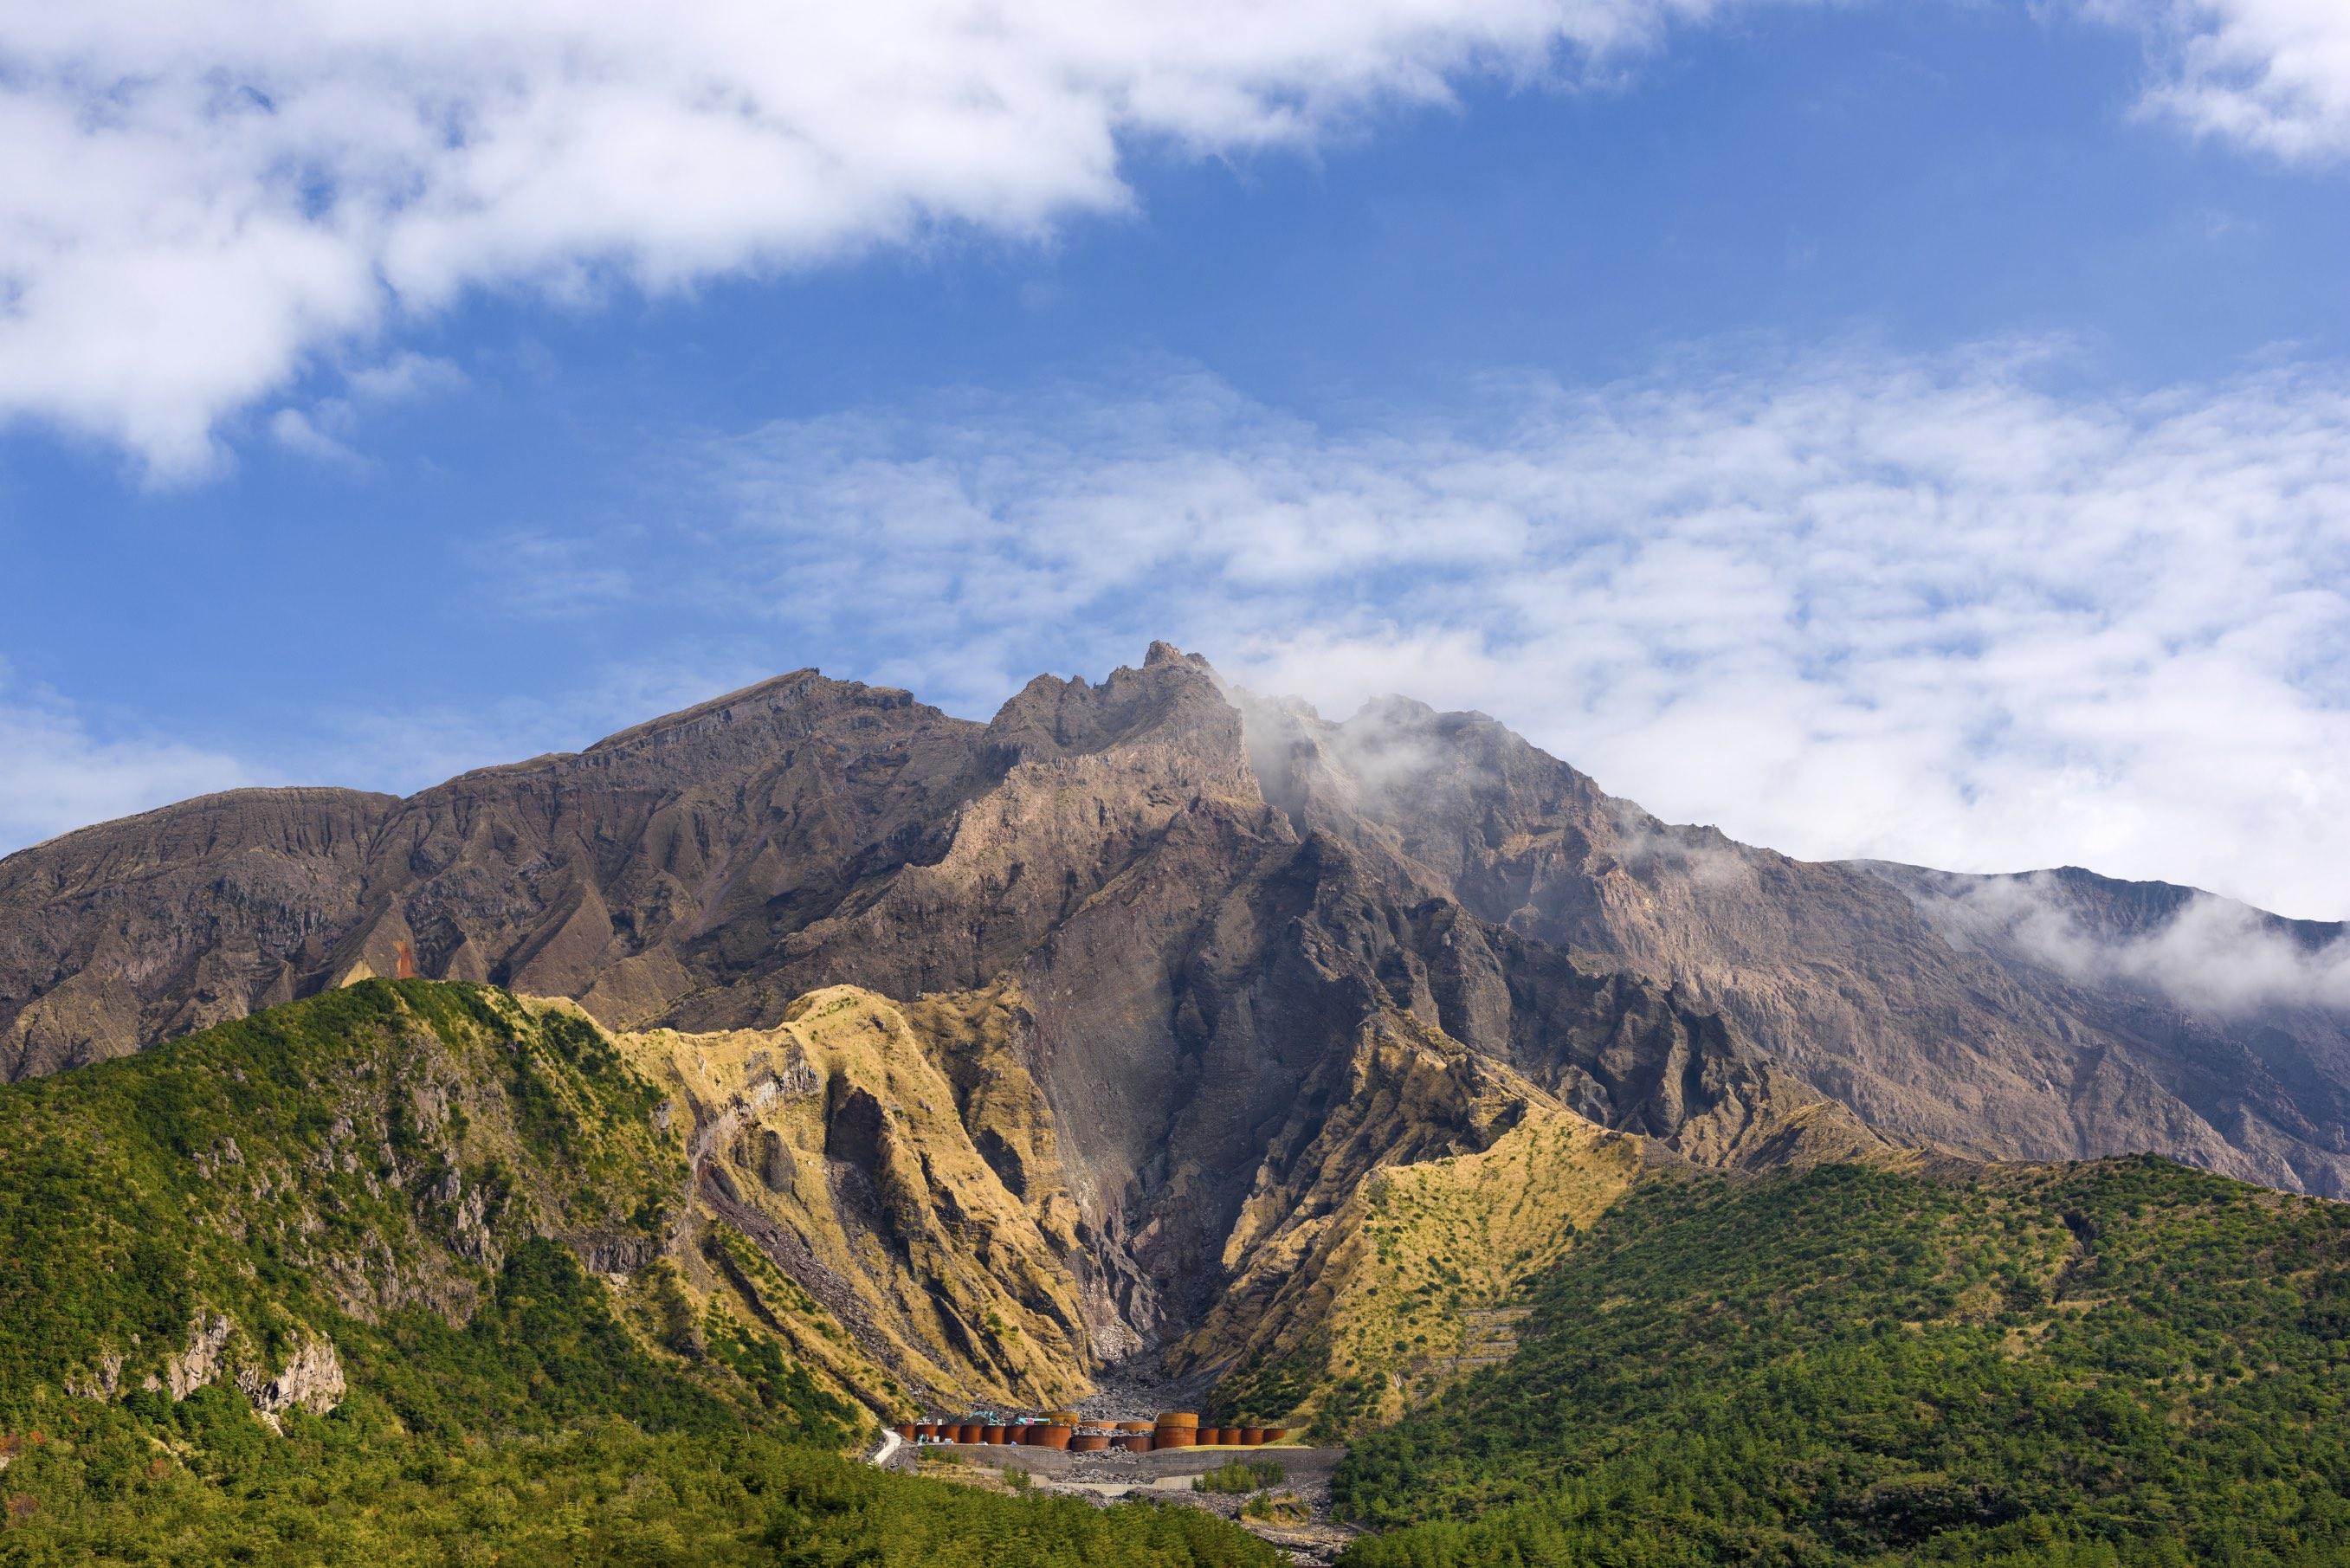 You can get up close and personal with the volcano on Sakurajima Island, Kagoshima.